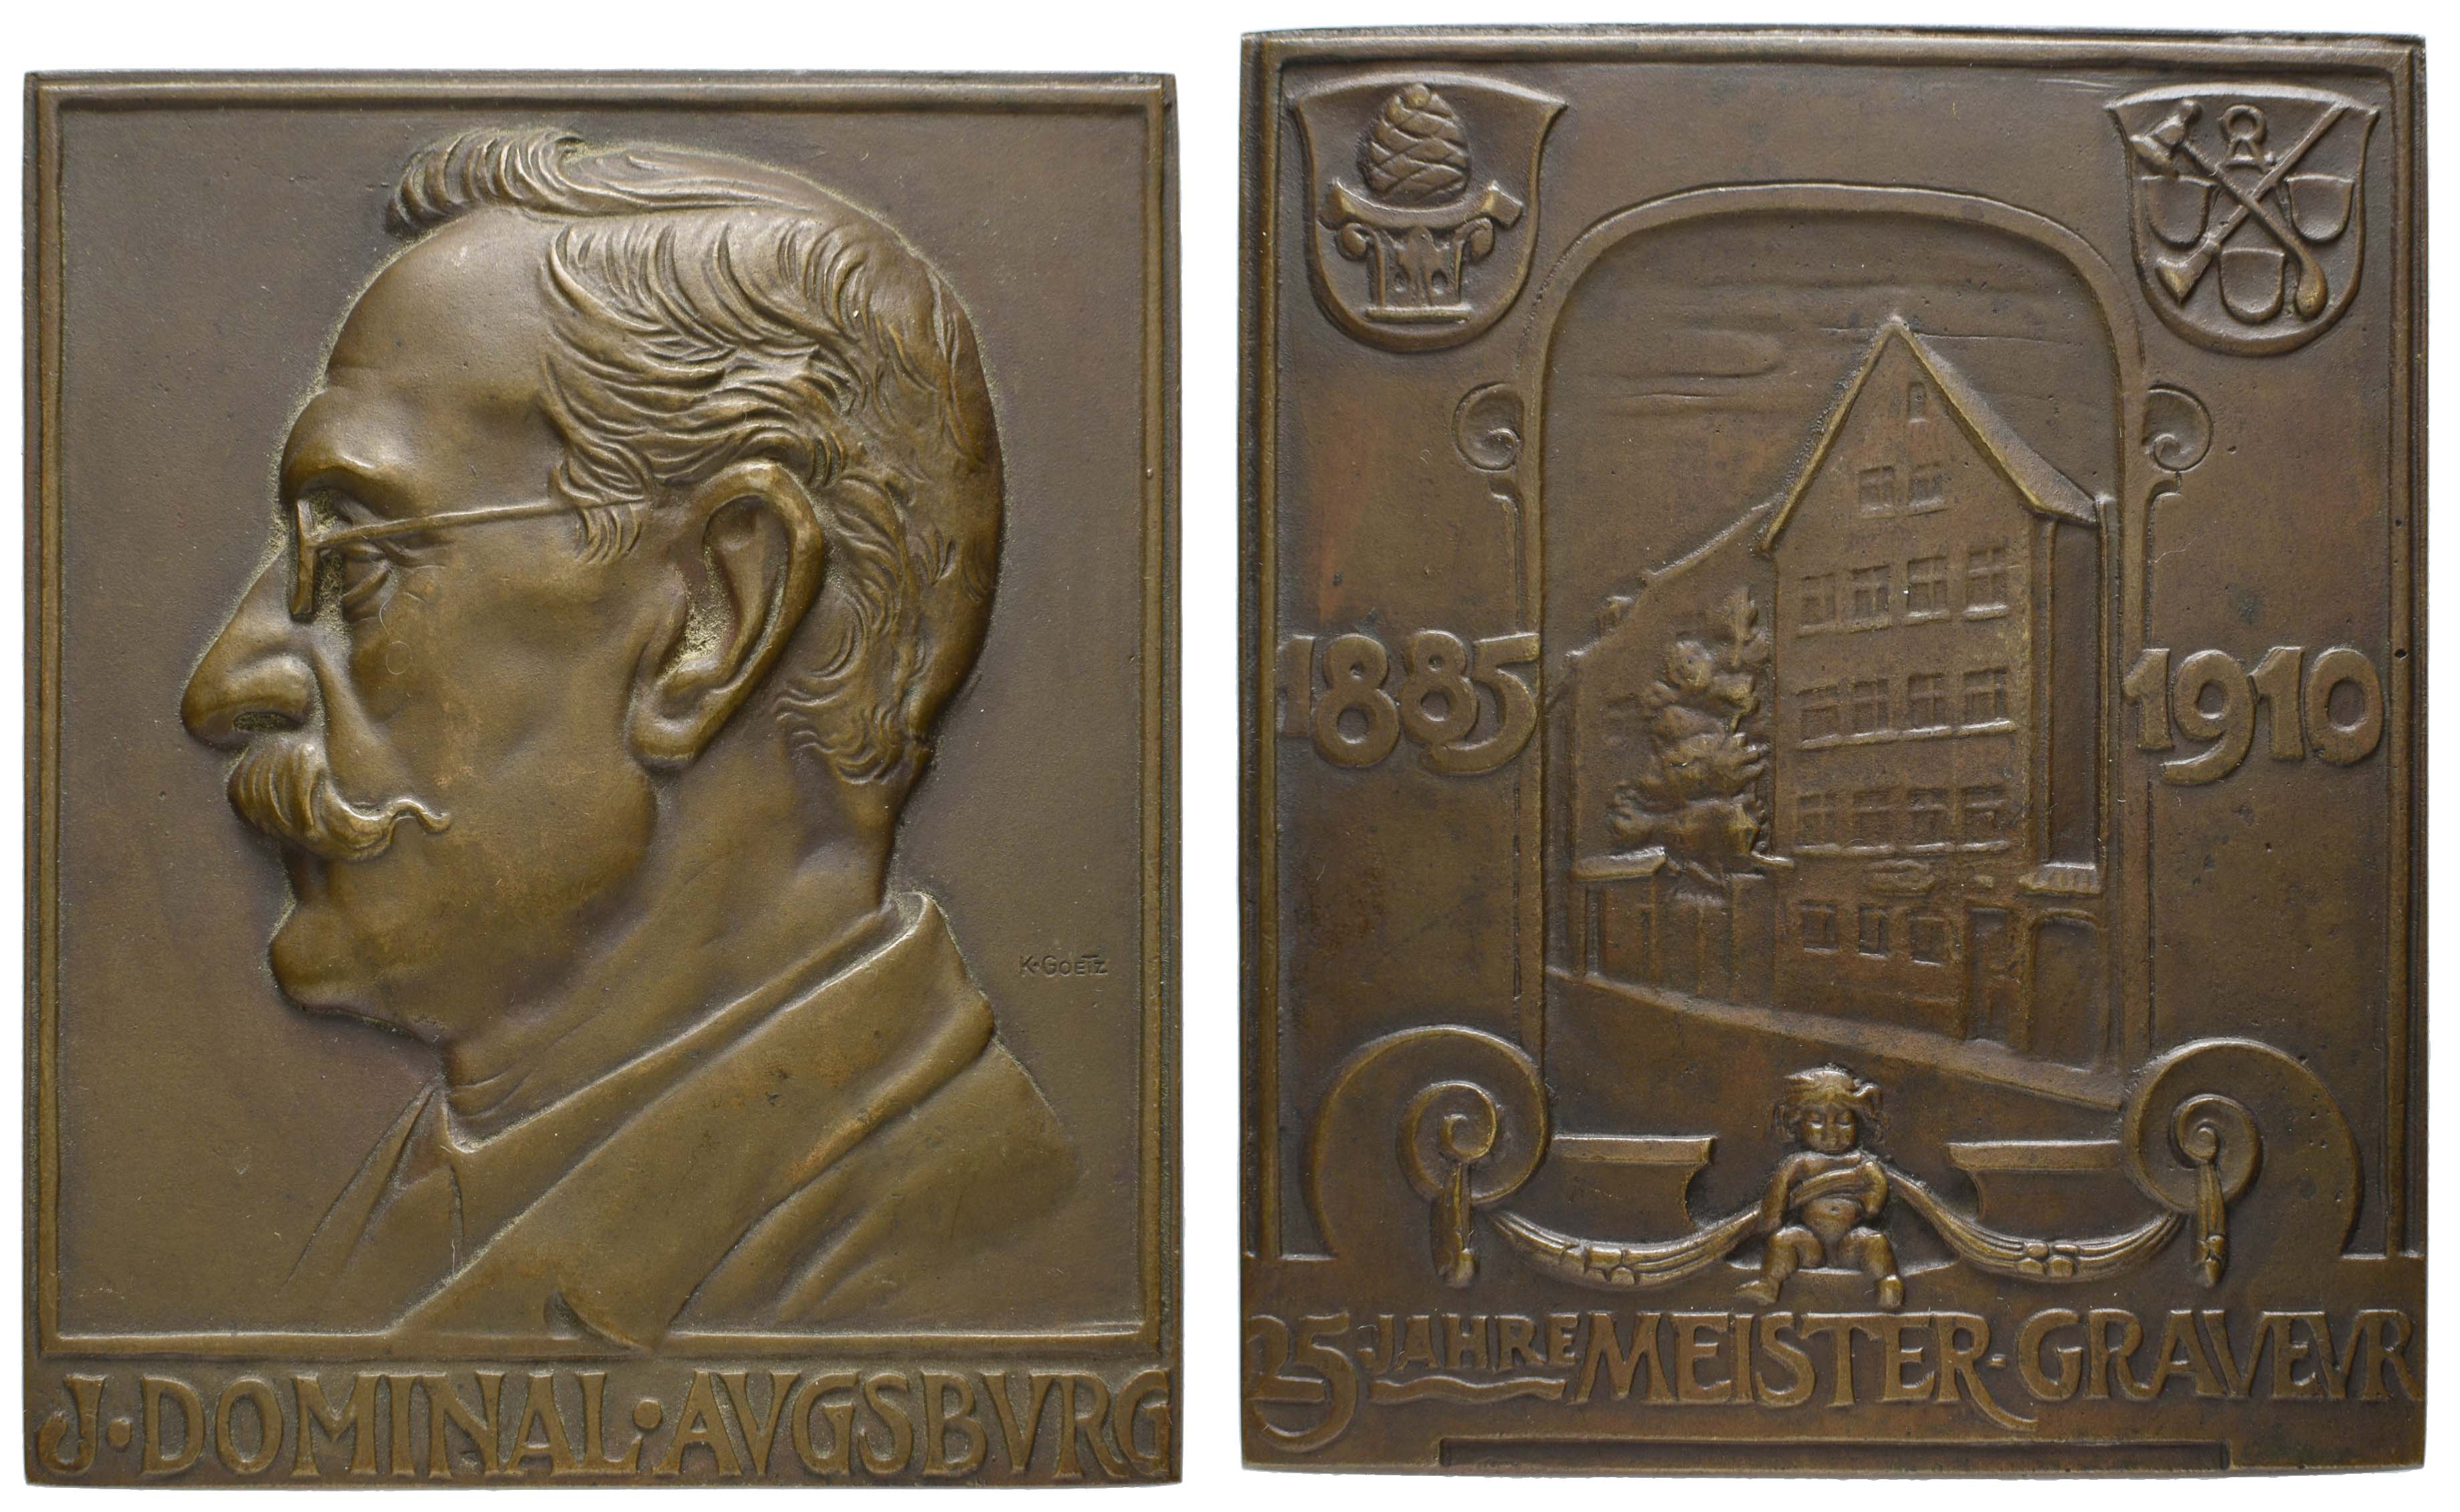 Lot 21 - Medaillen_Spezialsammlung Goetz-Medaillen  -  Auktionshaus Ulrich Felzmann GmbH & Co. KG Auction 170 International Autumn Auction 2020 Day 2